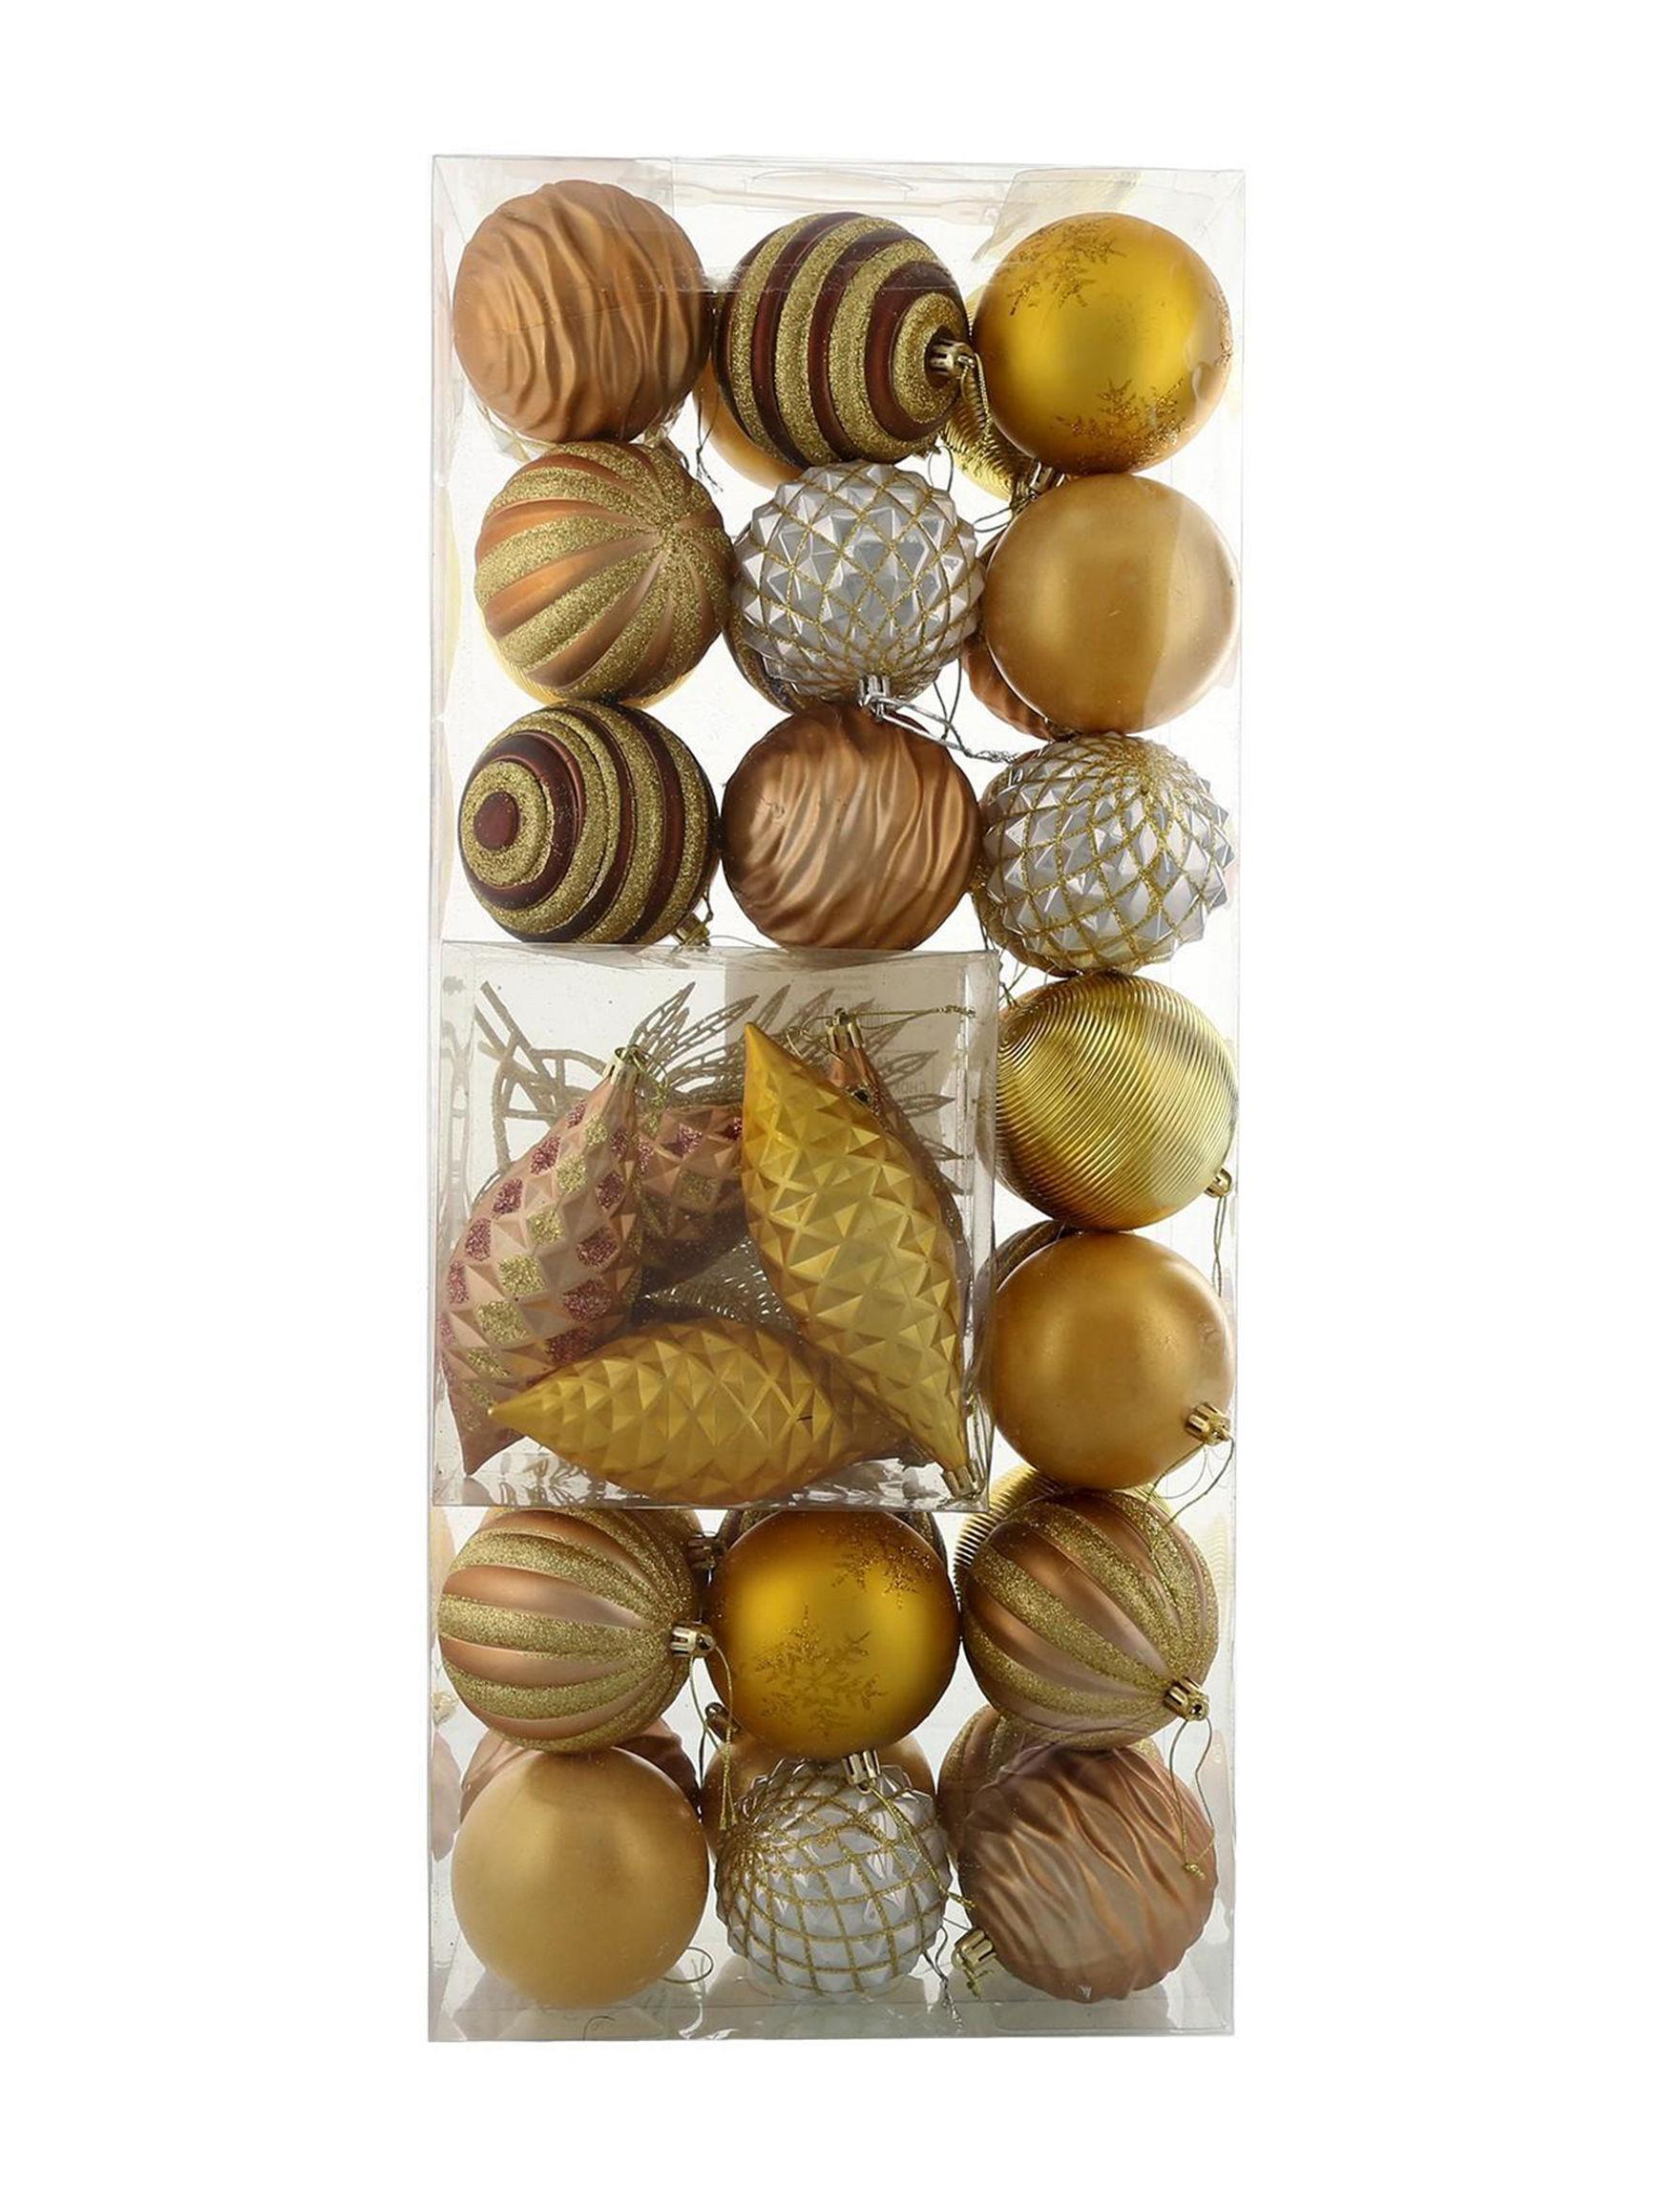 BuySeasons Gold Decorative Objects Ornaments Holiday Decor